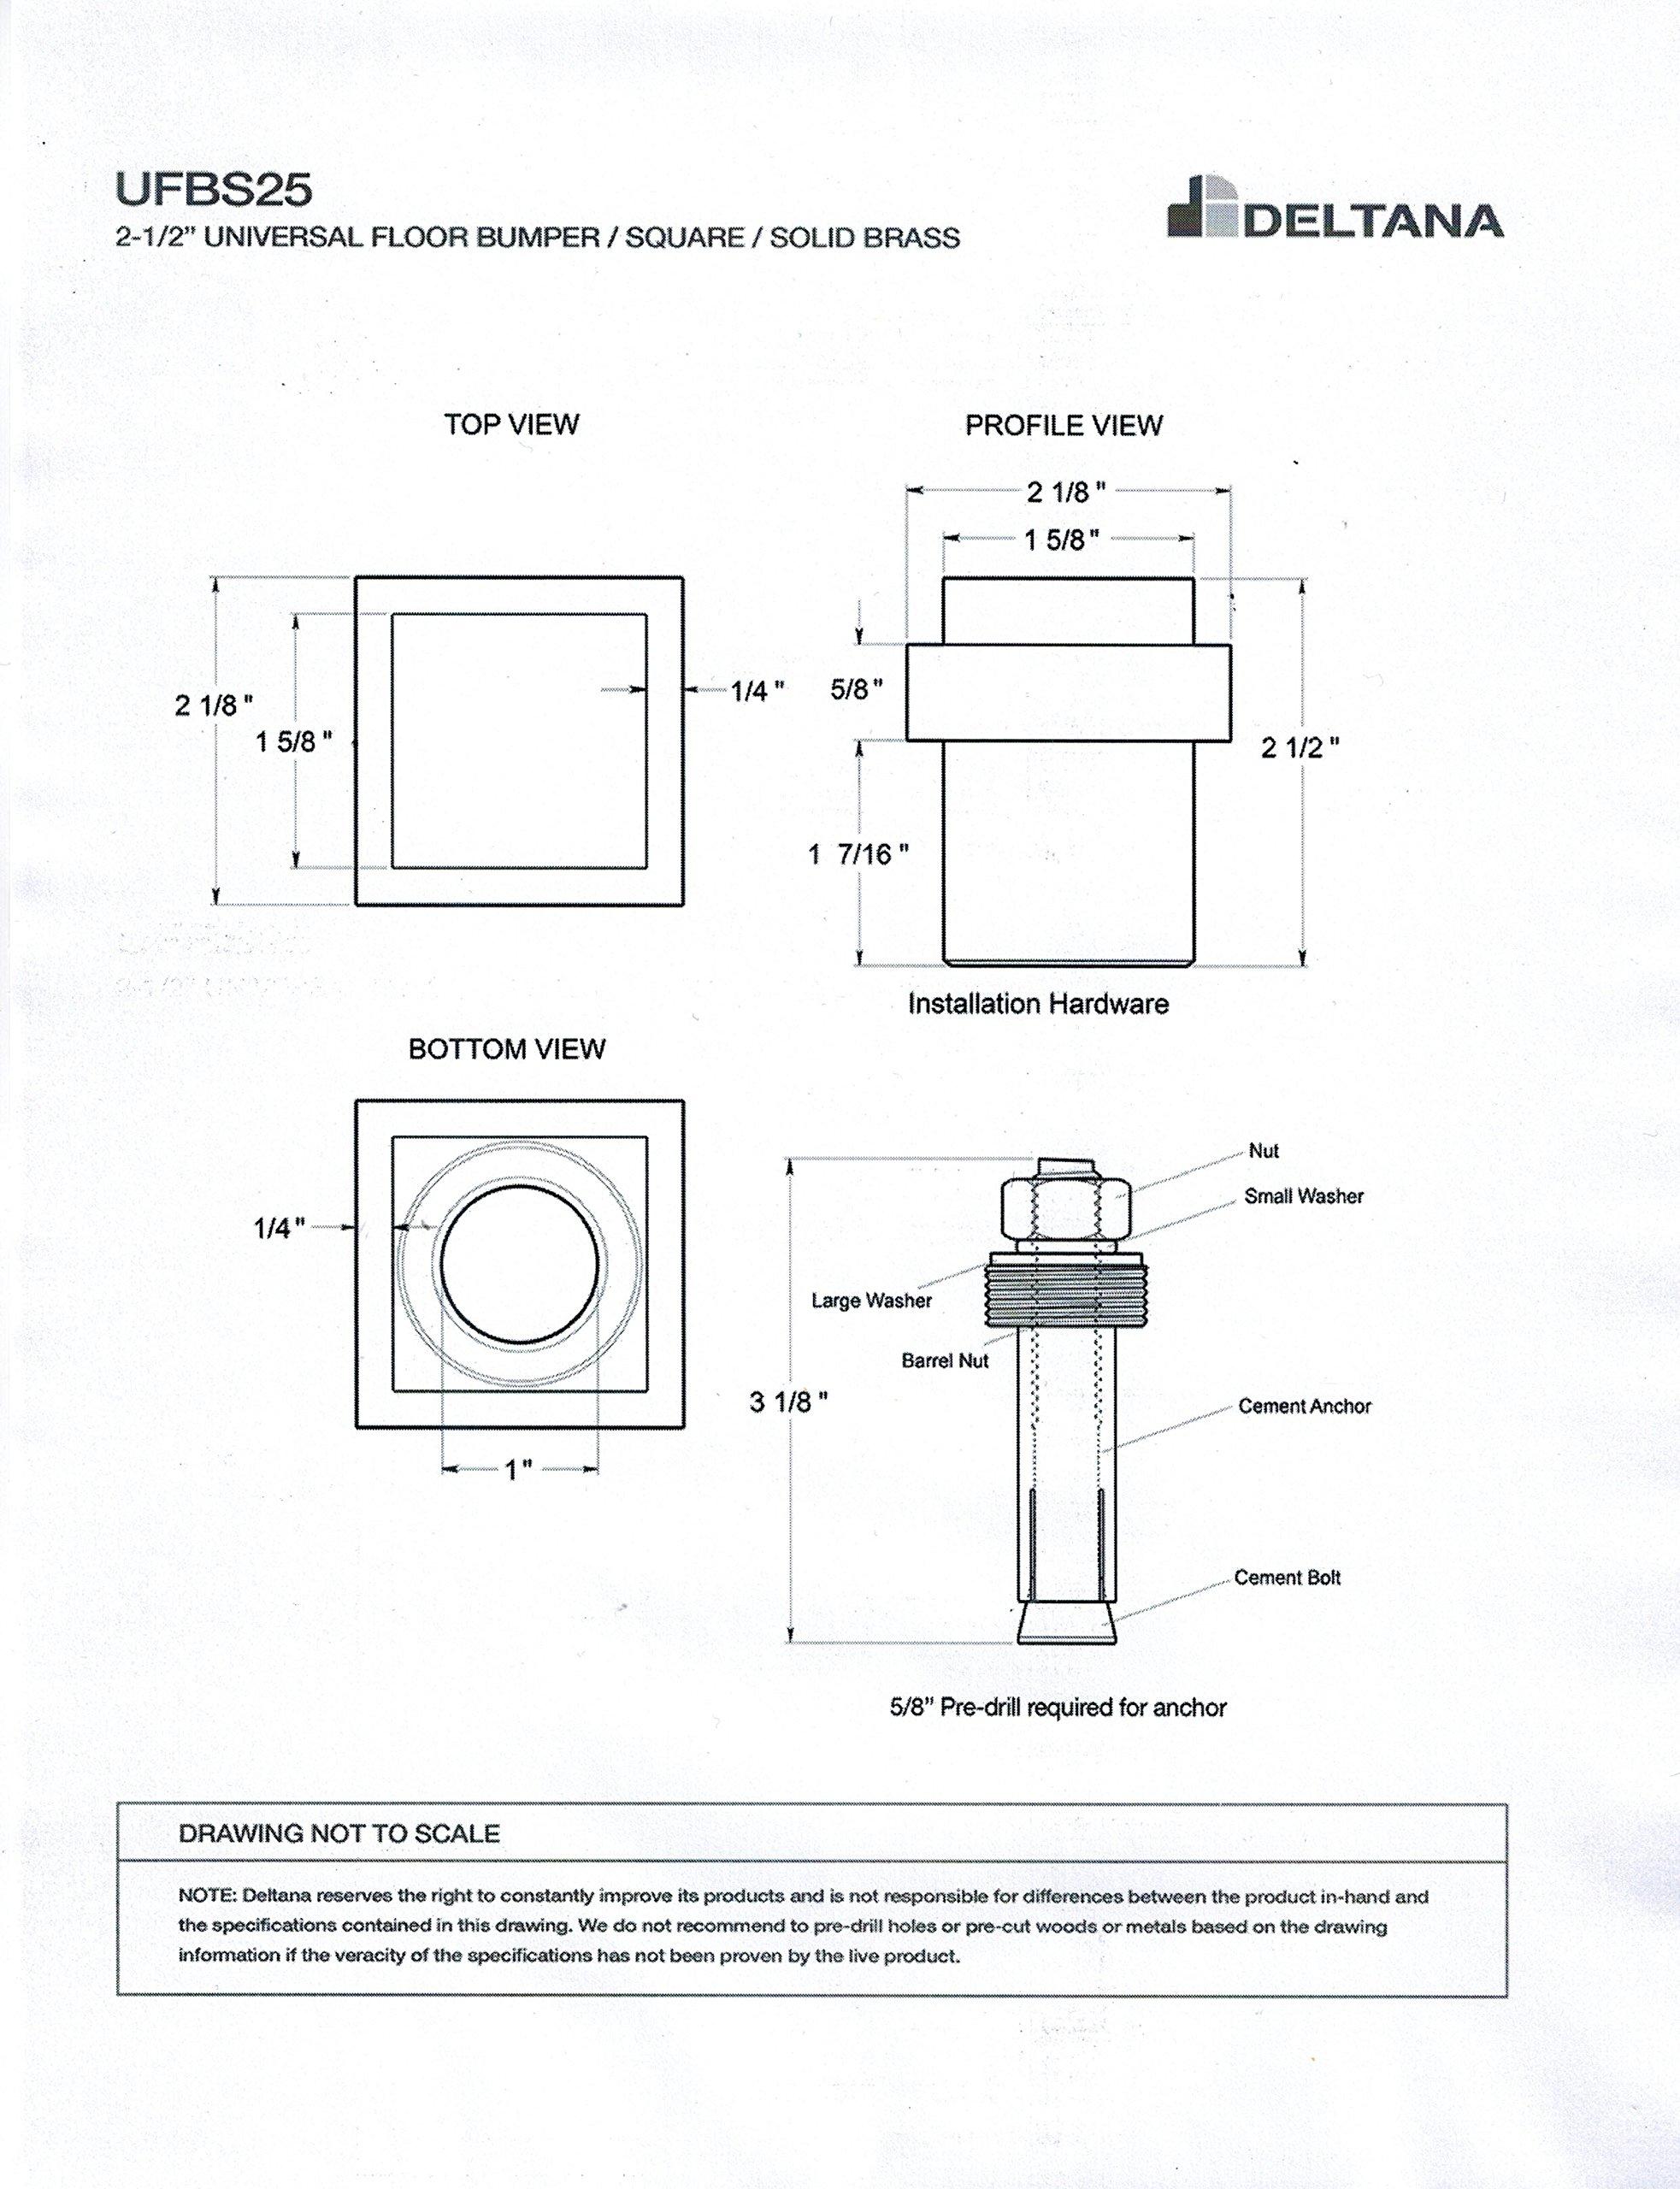 Deltana Square Universal Floor Bumper 2-1/2'', Solid Brass (Polished Nickel)